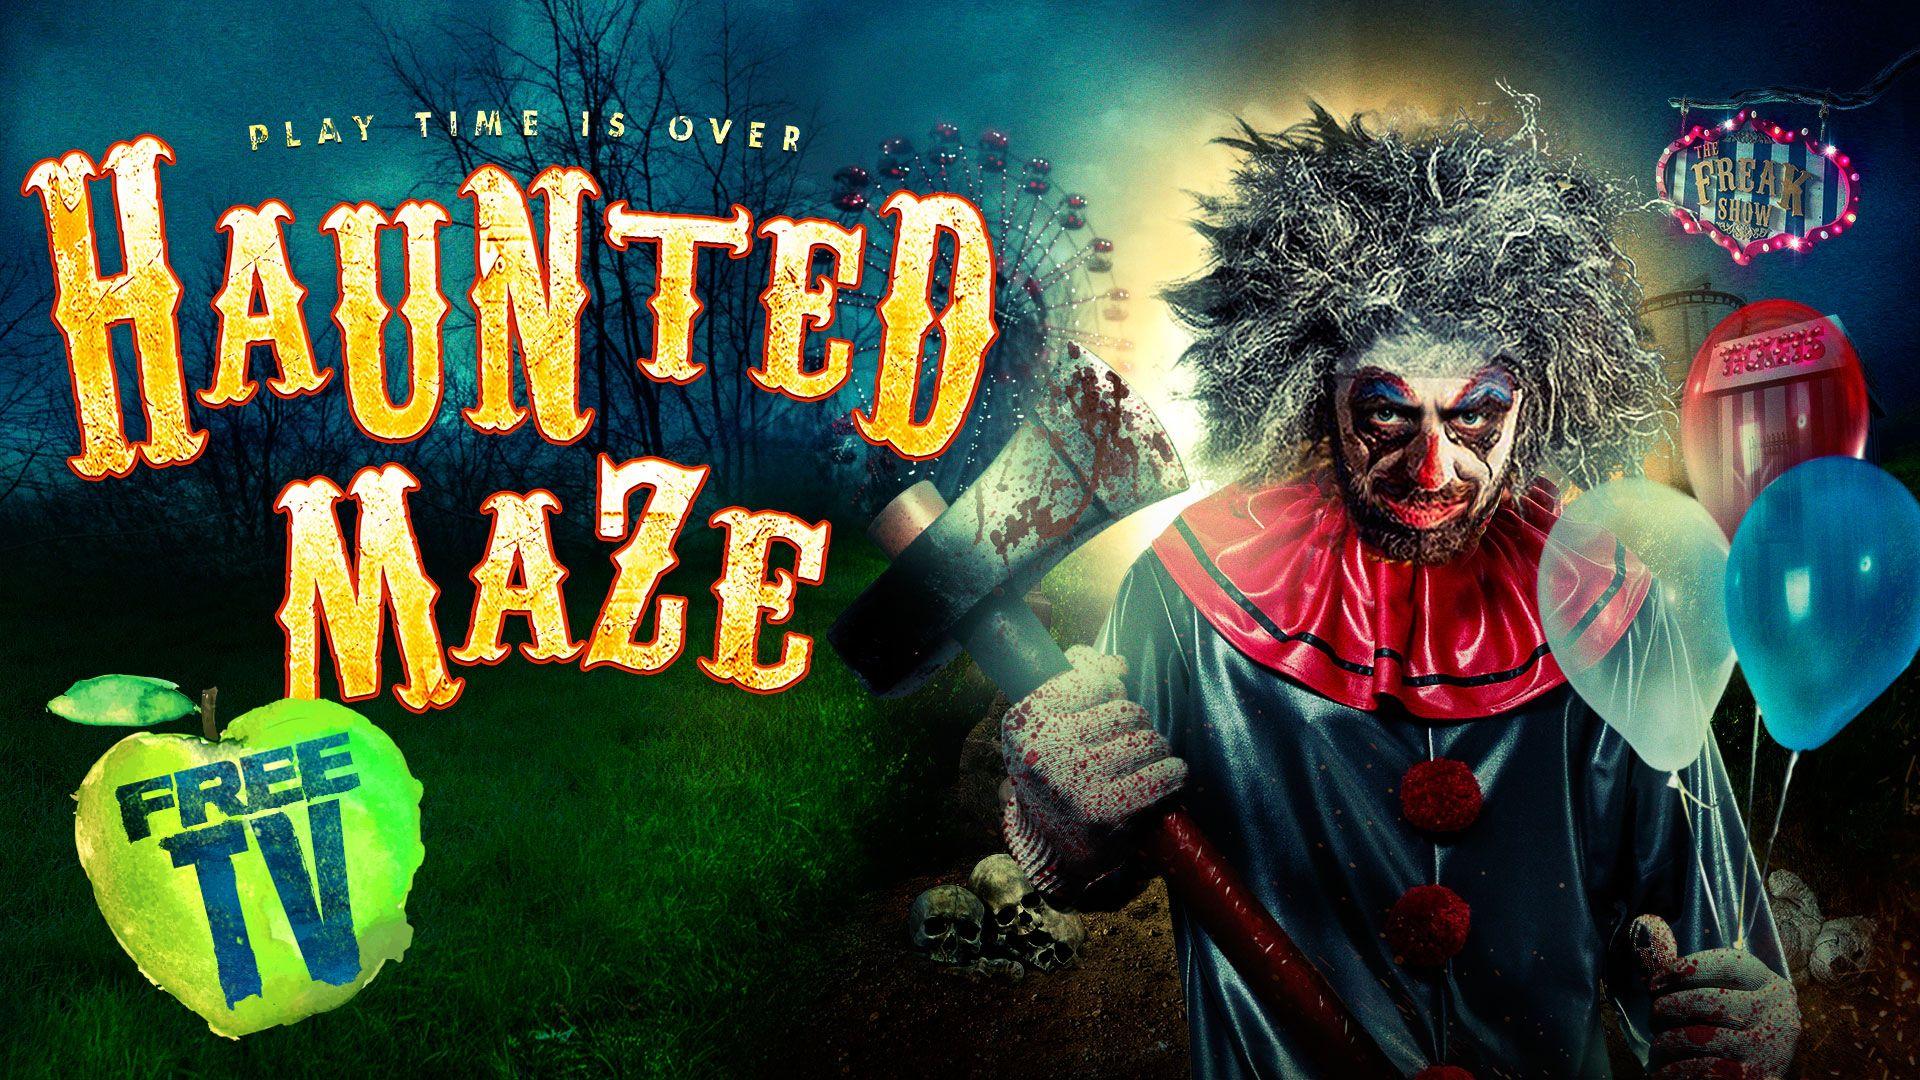 HAUNTED MAZE in 2020 Haunted maze, Halloween festival